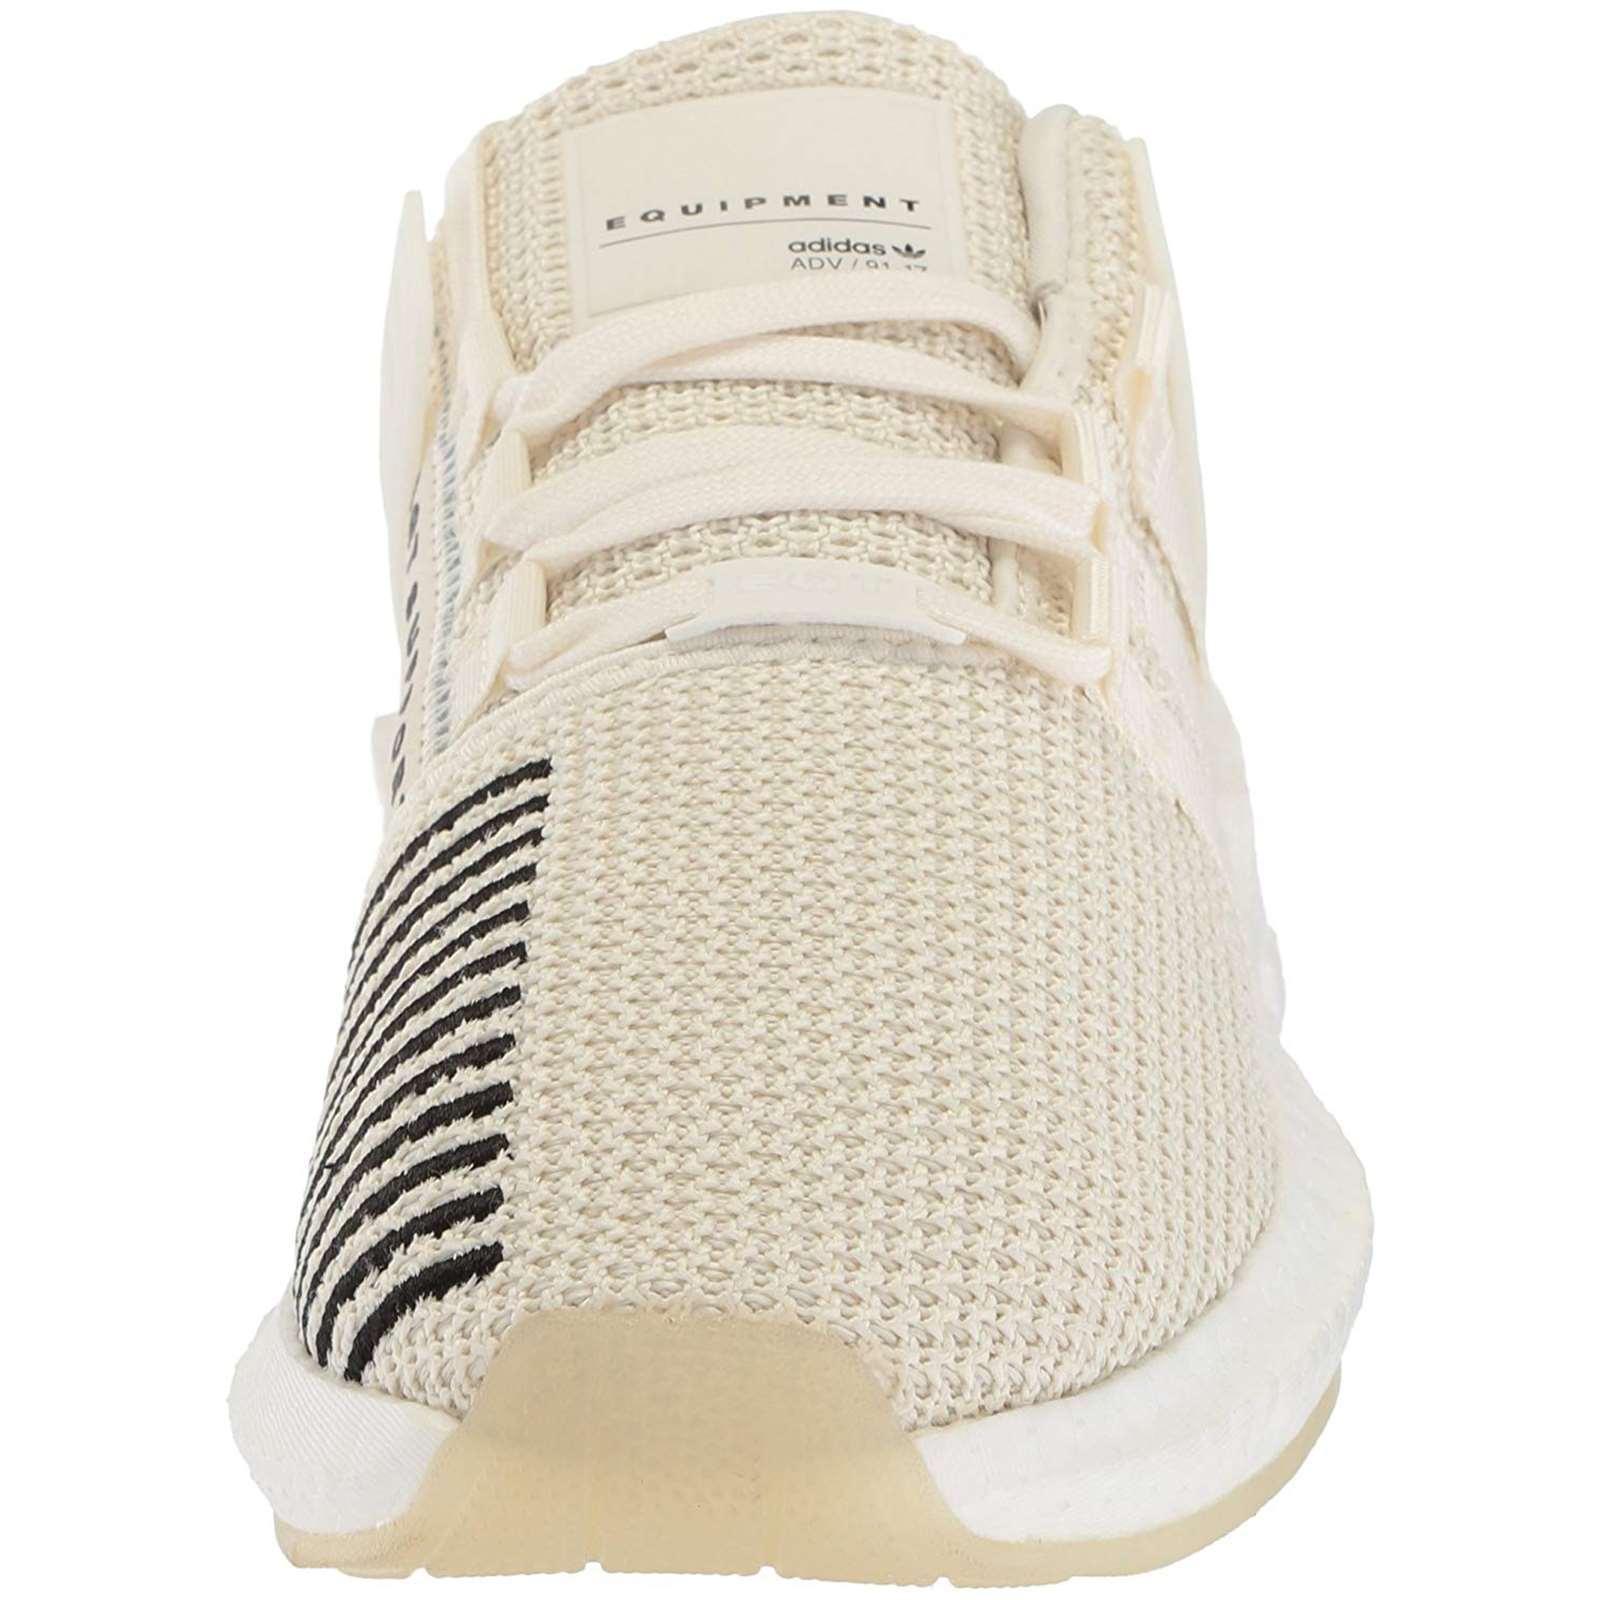 4e5ed9f7115d ... Nuevas Adidas Zapatos Atléticos Para Para Para Hombre EQT Soporte 93 17  tenis De Correr ...